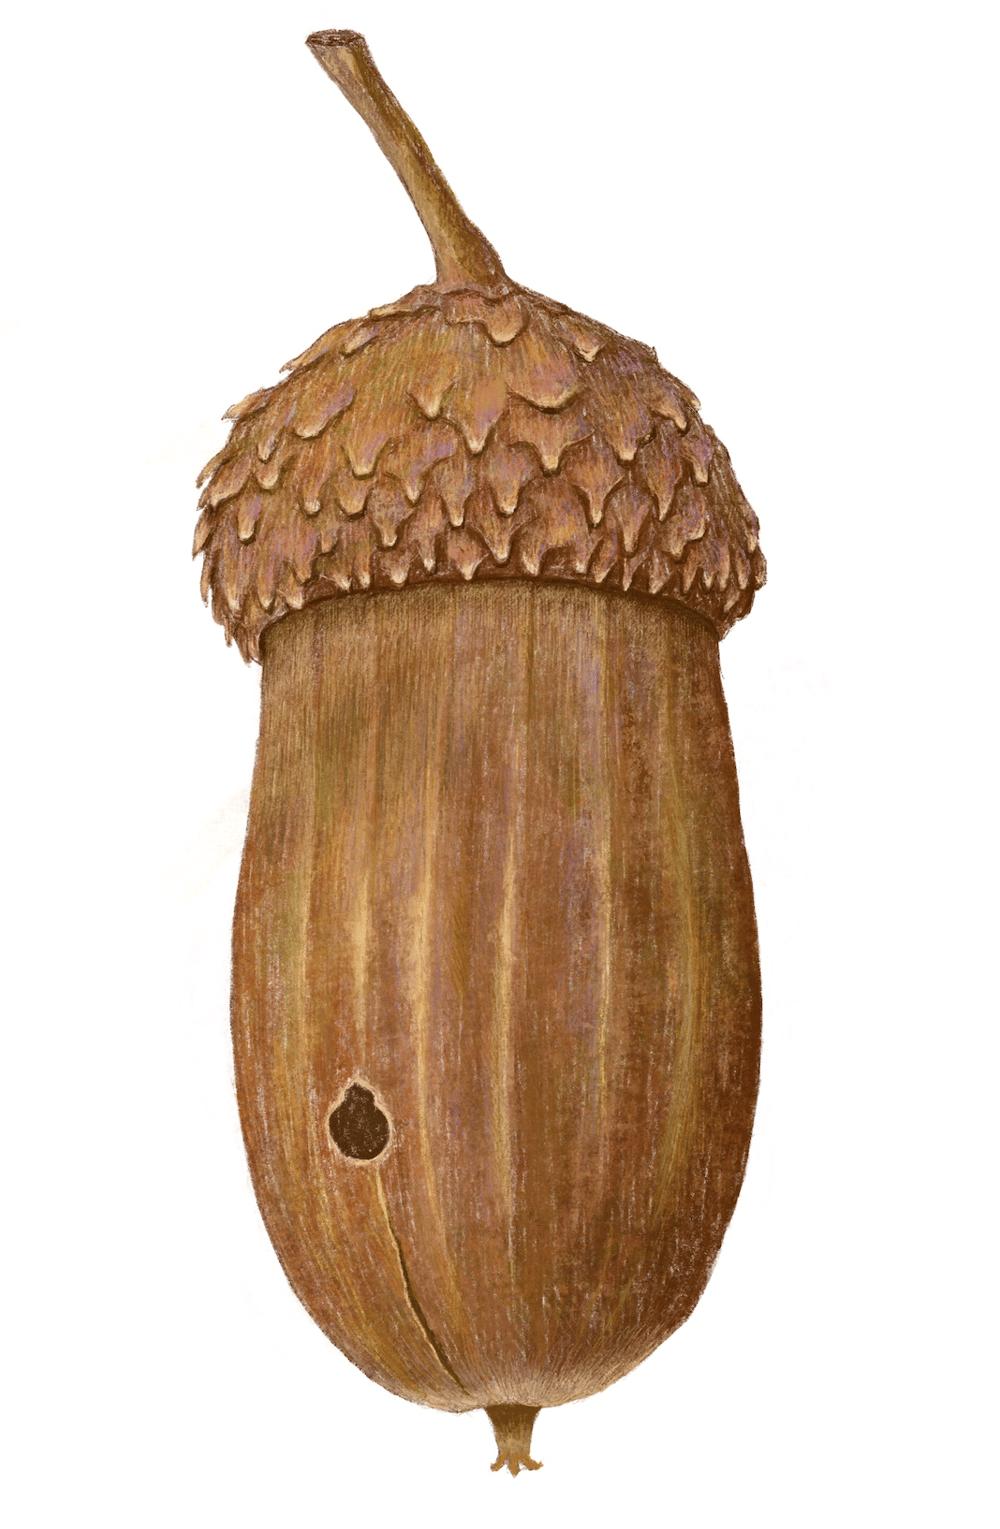 acorn - image 1 - student project